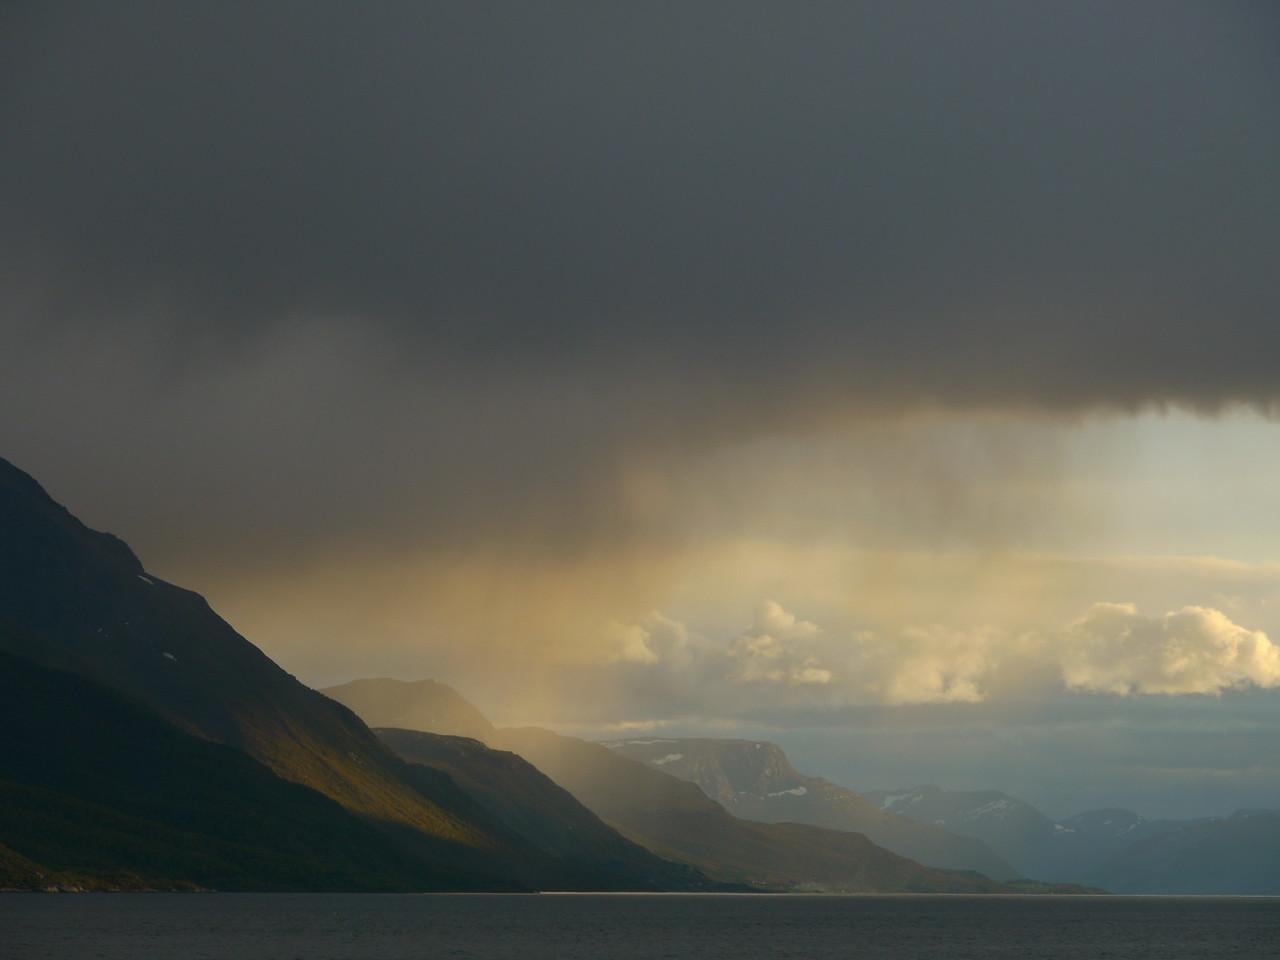 Velotour Lofoten-Vesterålen-Narvik / @RobAng 2012 / Salangsverket, Sjøvegan, Troms, NOR, Norwegen, 71.8286 m ü/M, 13/09/2012 18:34:04